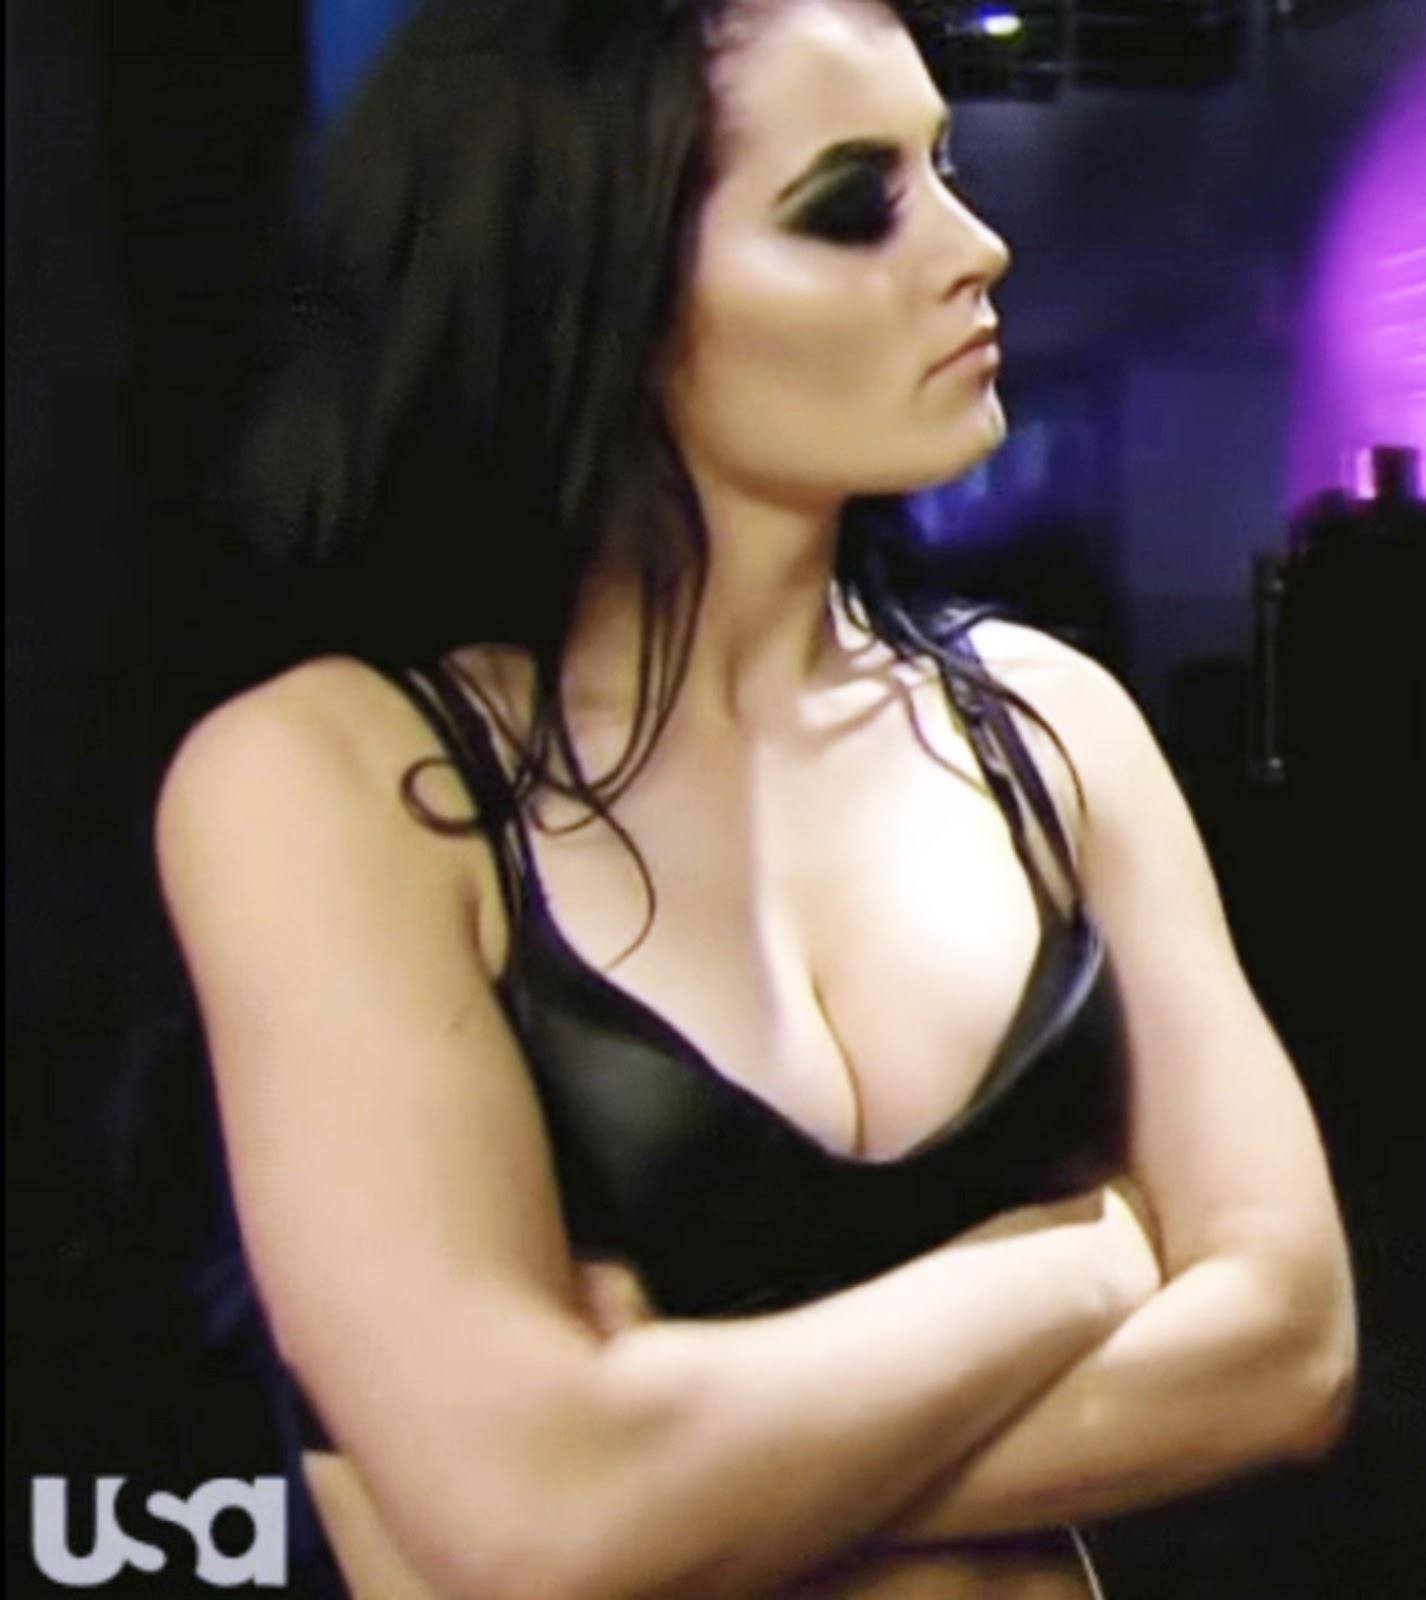 Hot wwe paige Paige (wrestler)